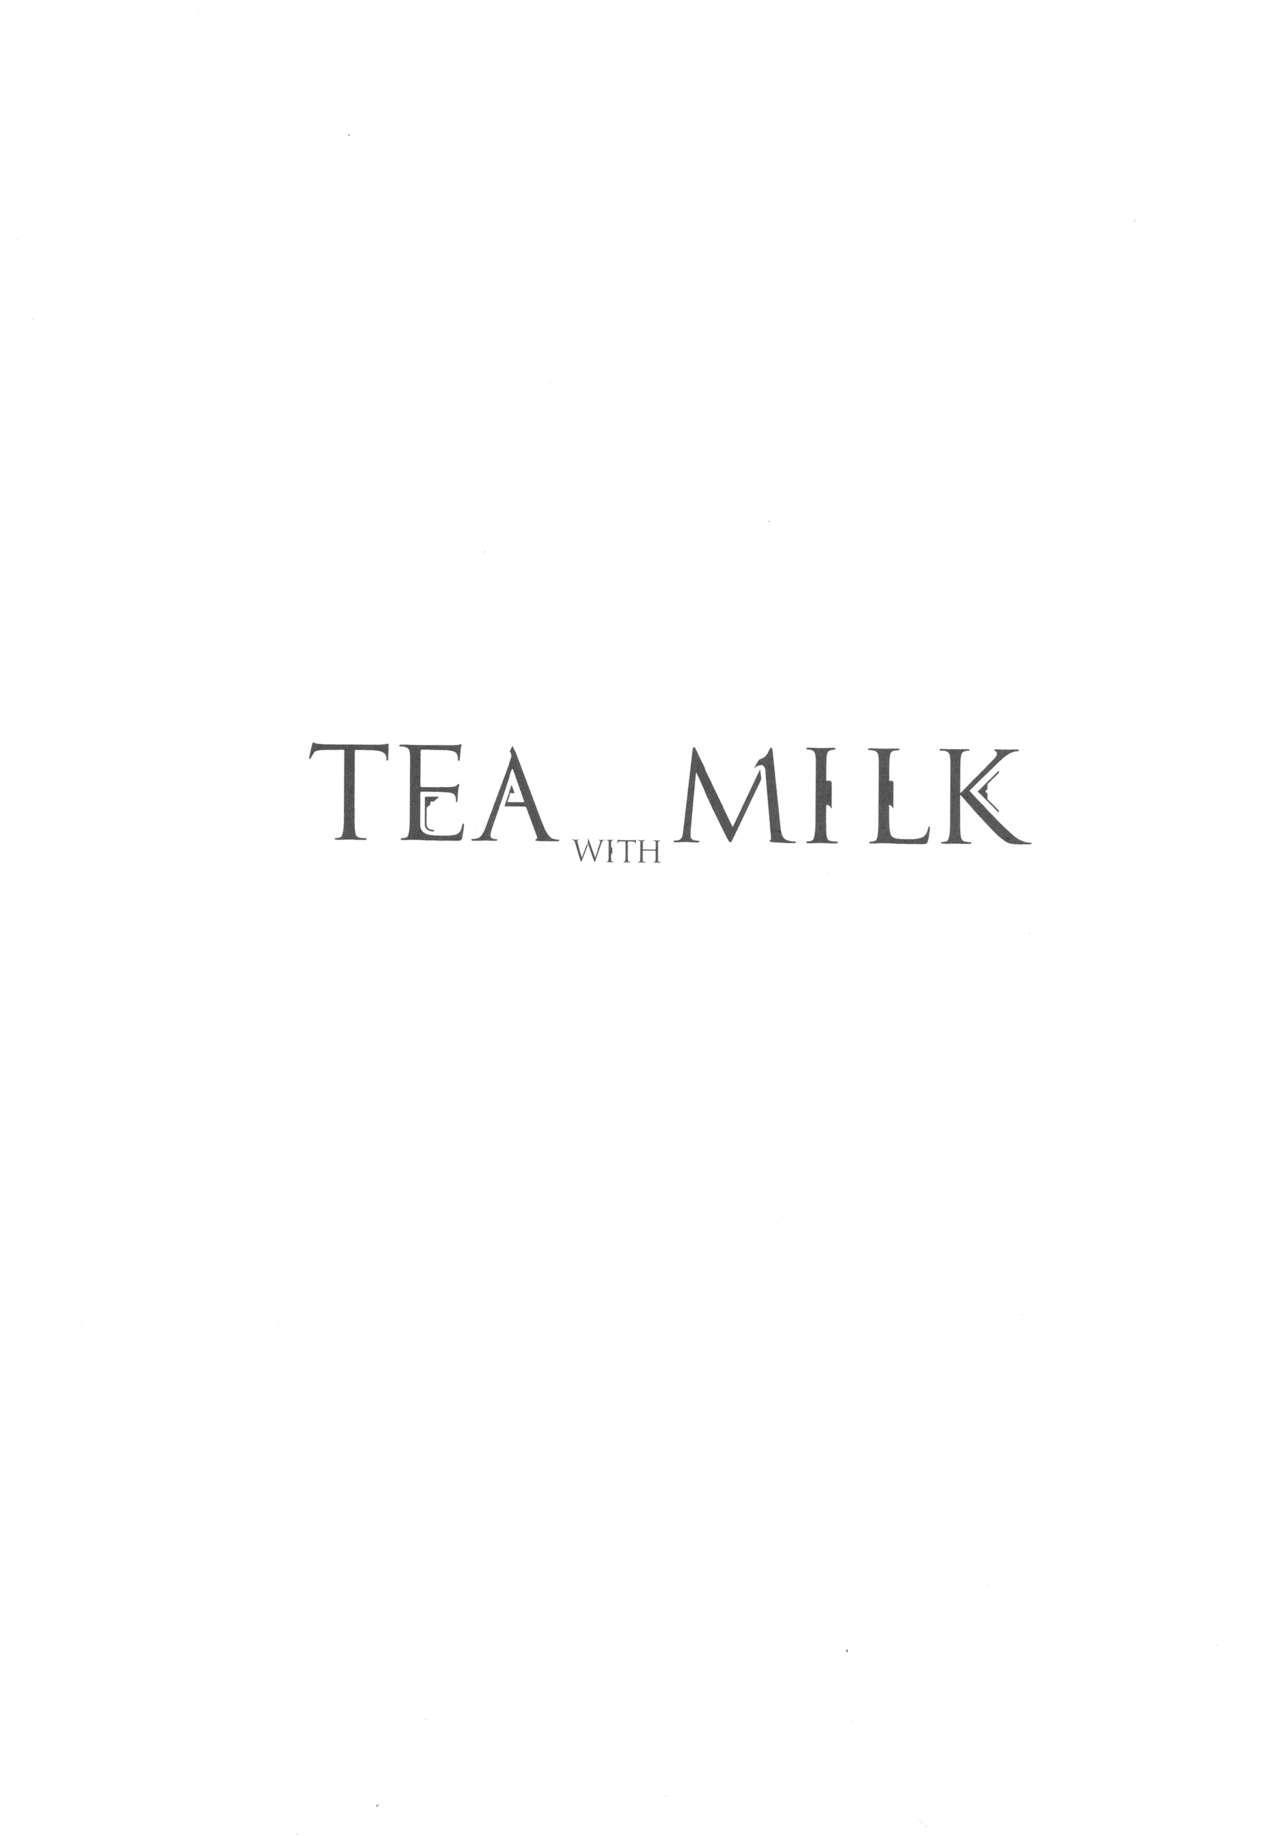 TEA WITH MILK 2